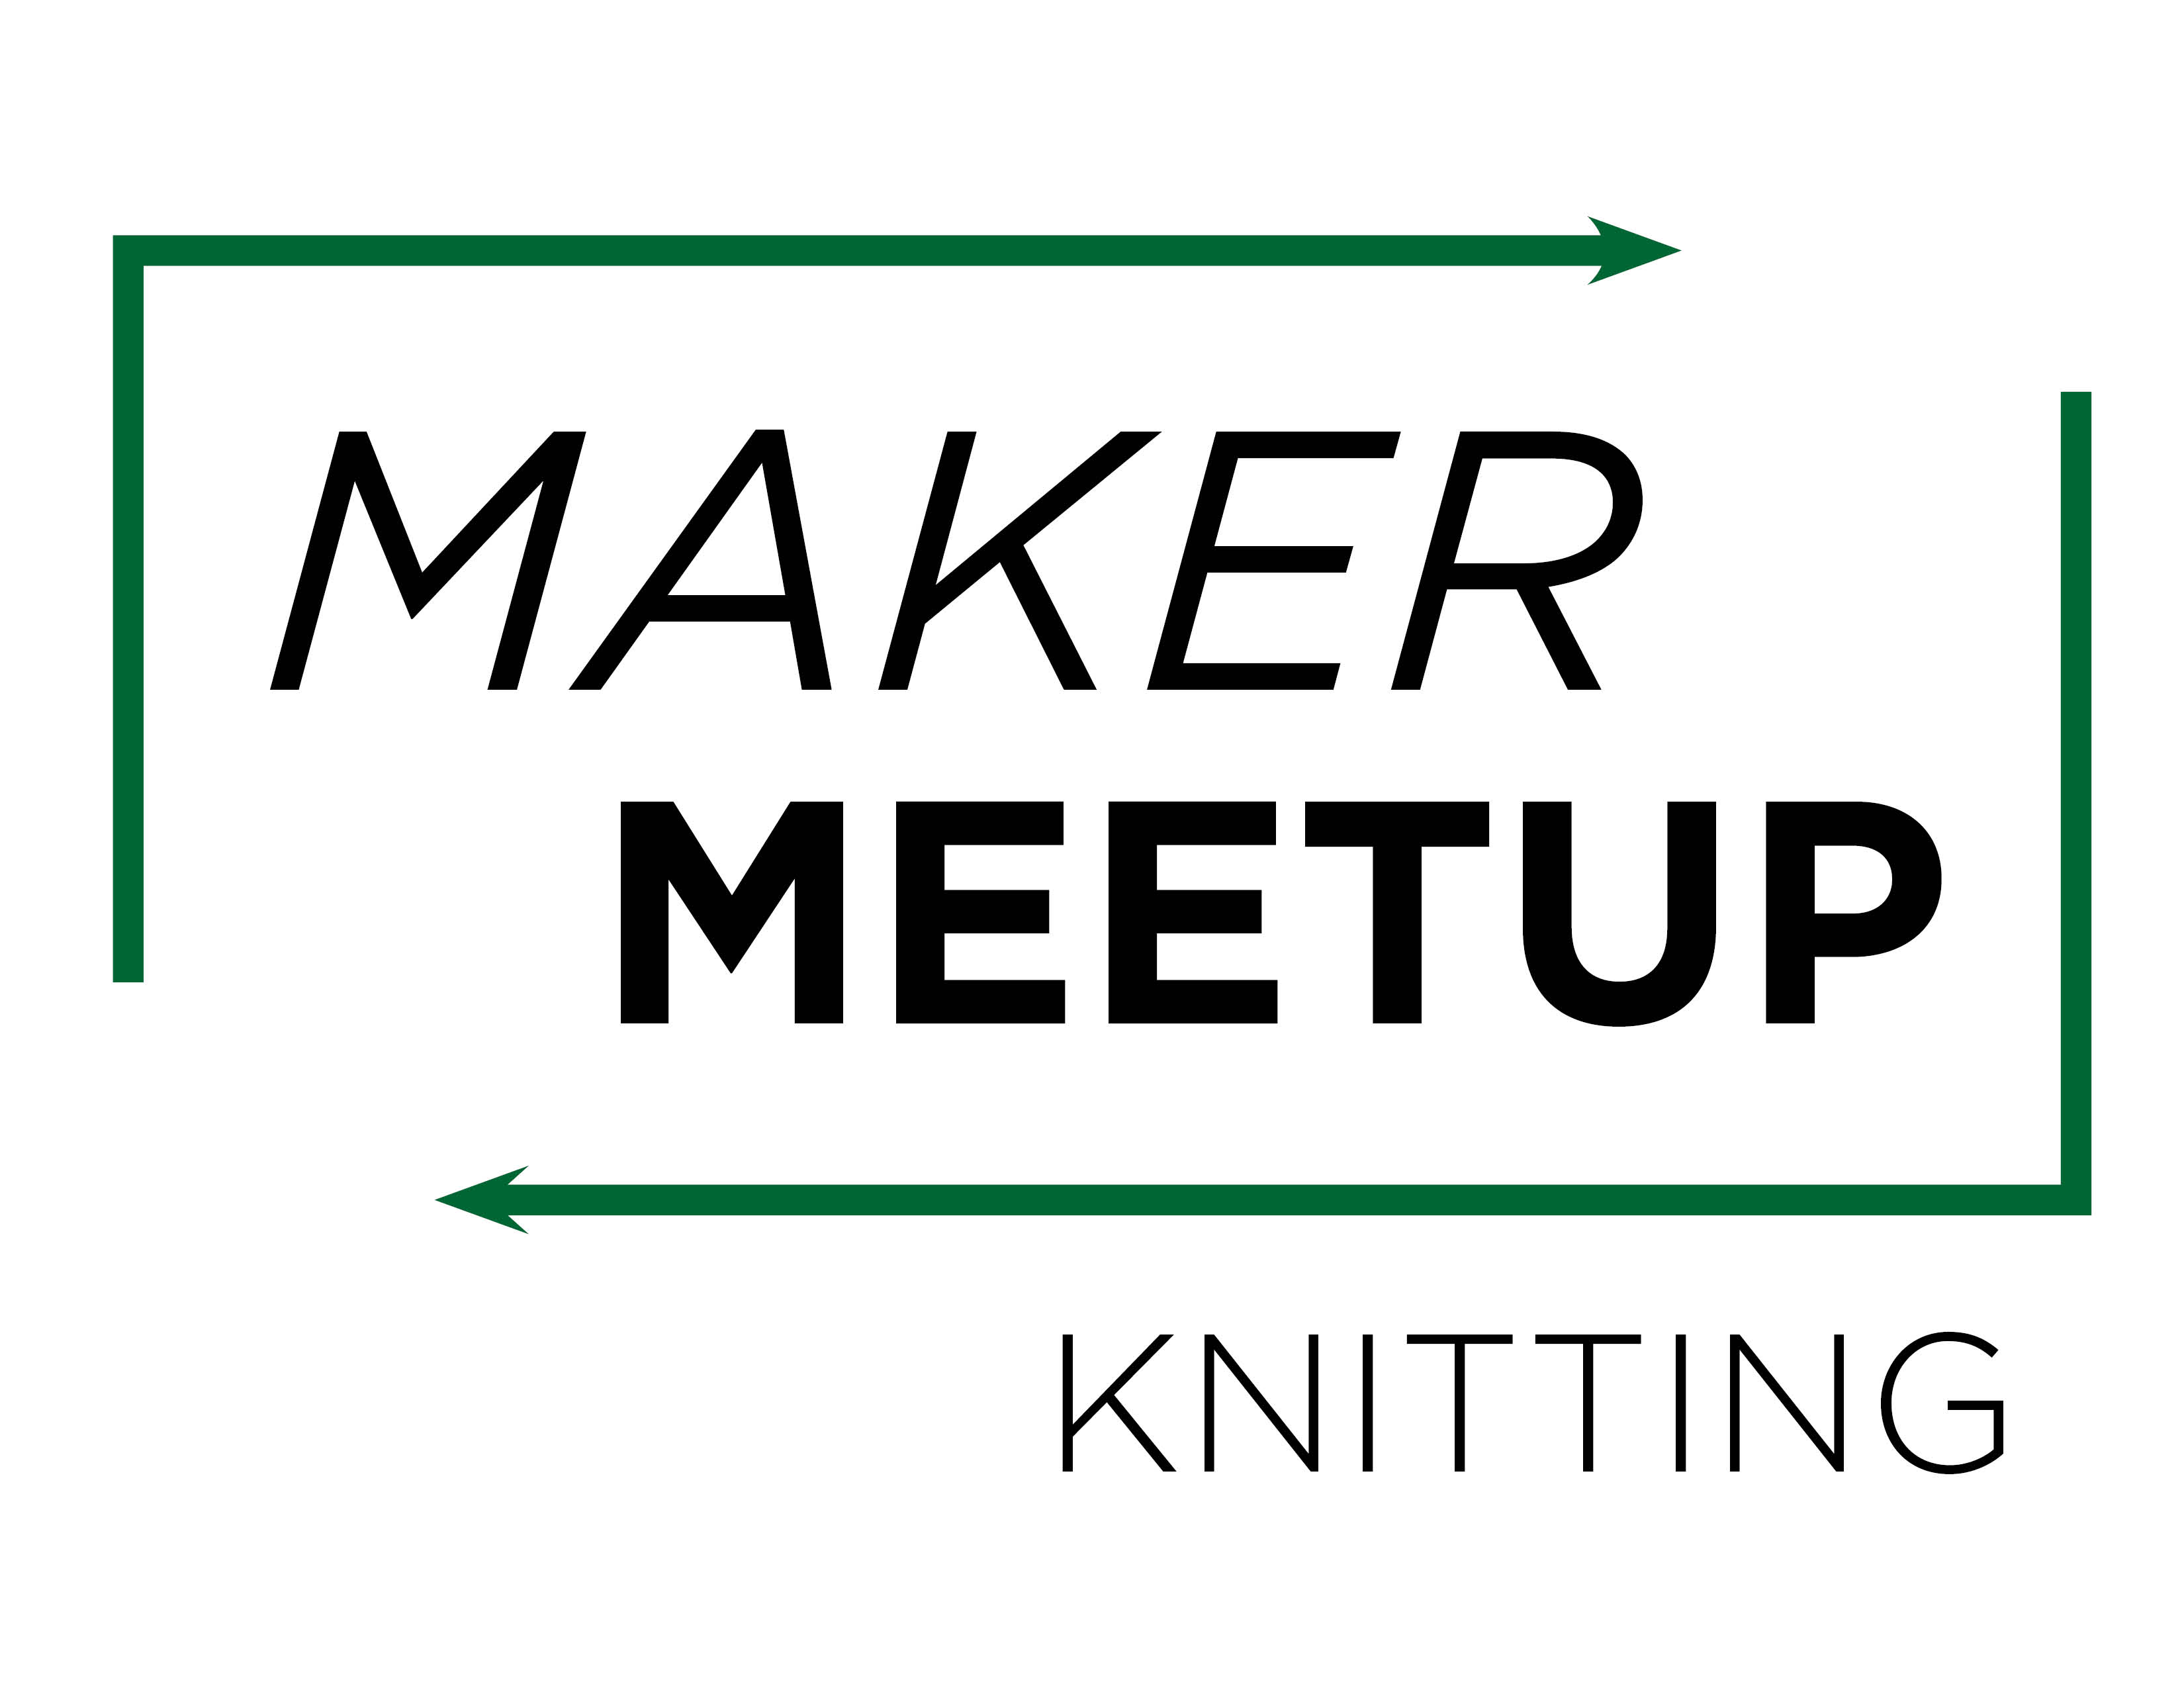 Virtual Maker Meetup: Knitting